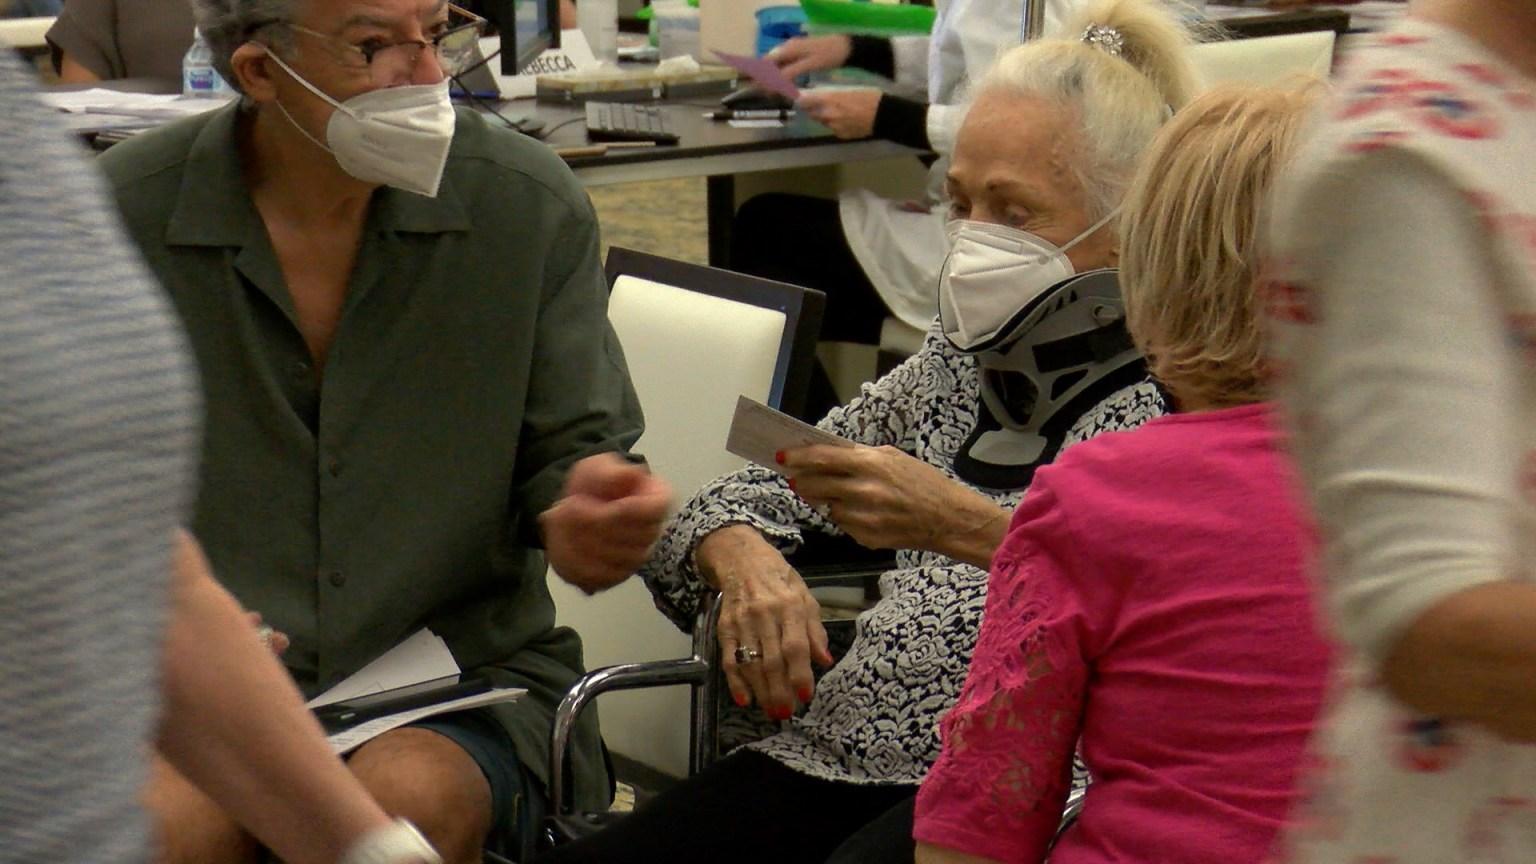 Scammers target seniors seeking COVID immunizations